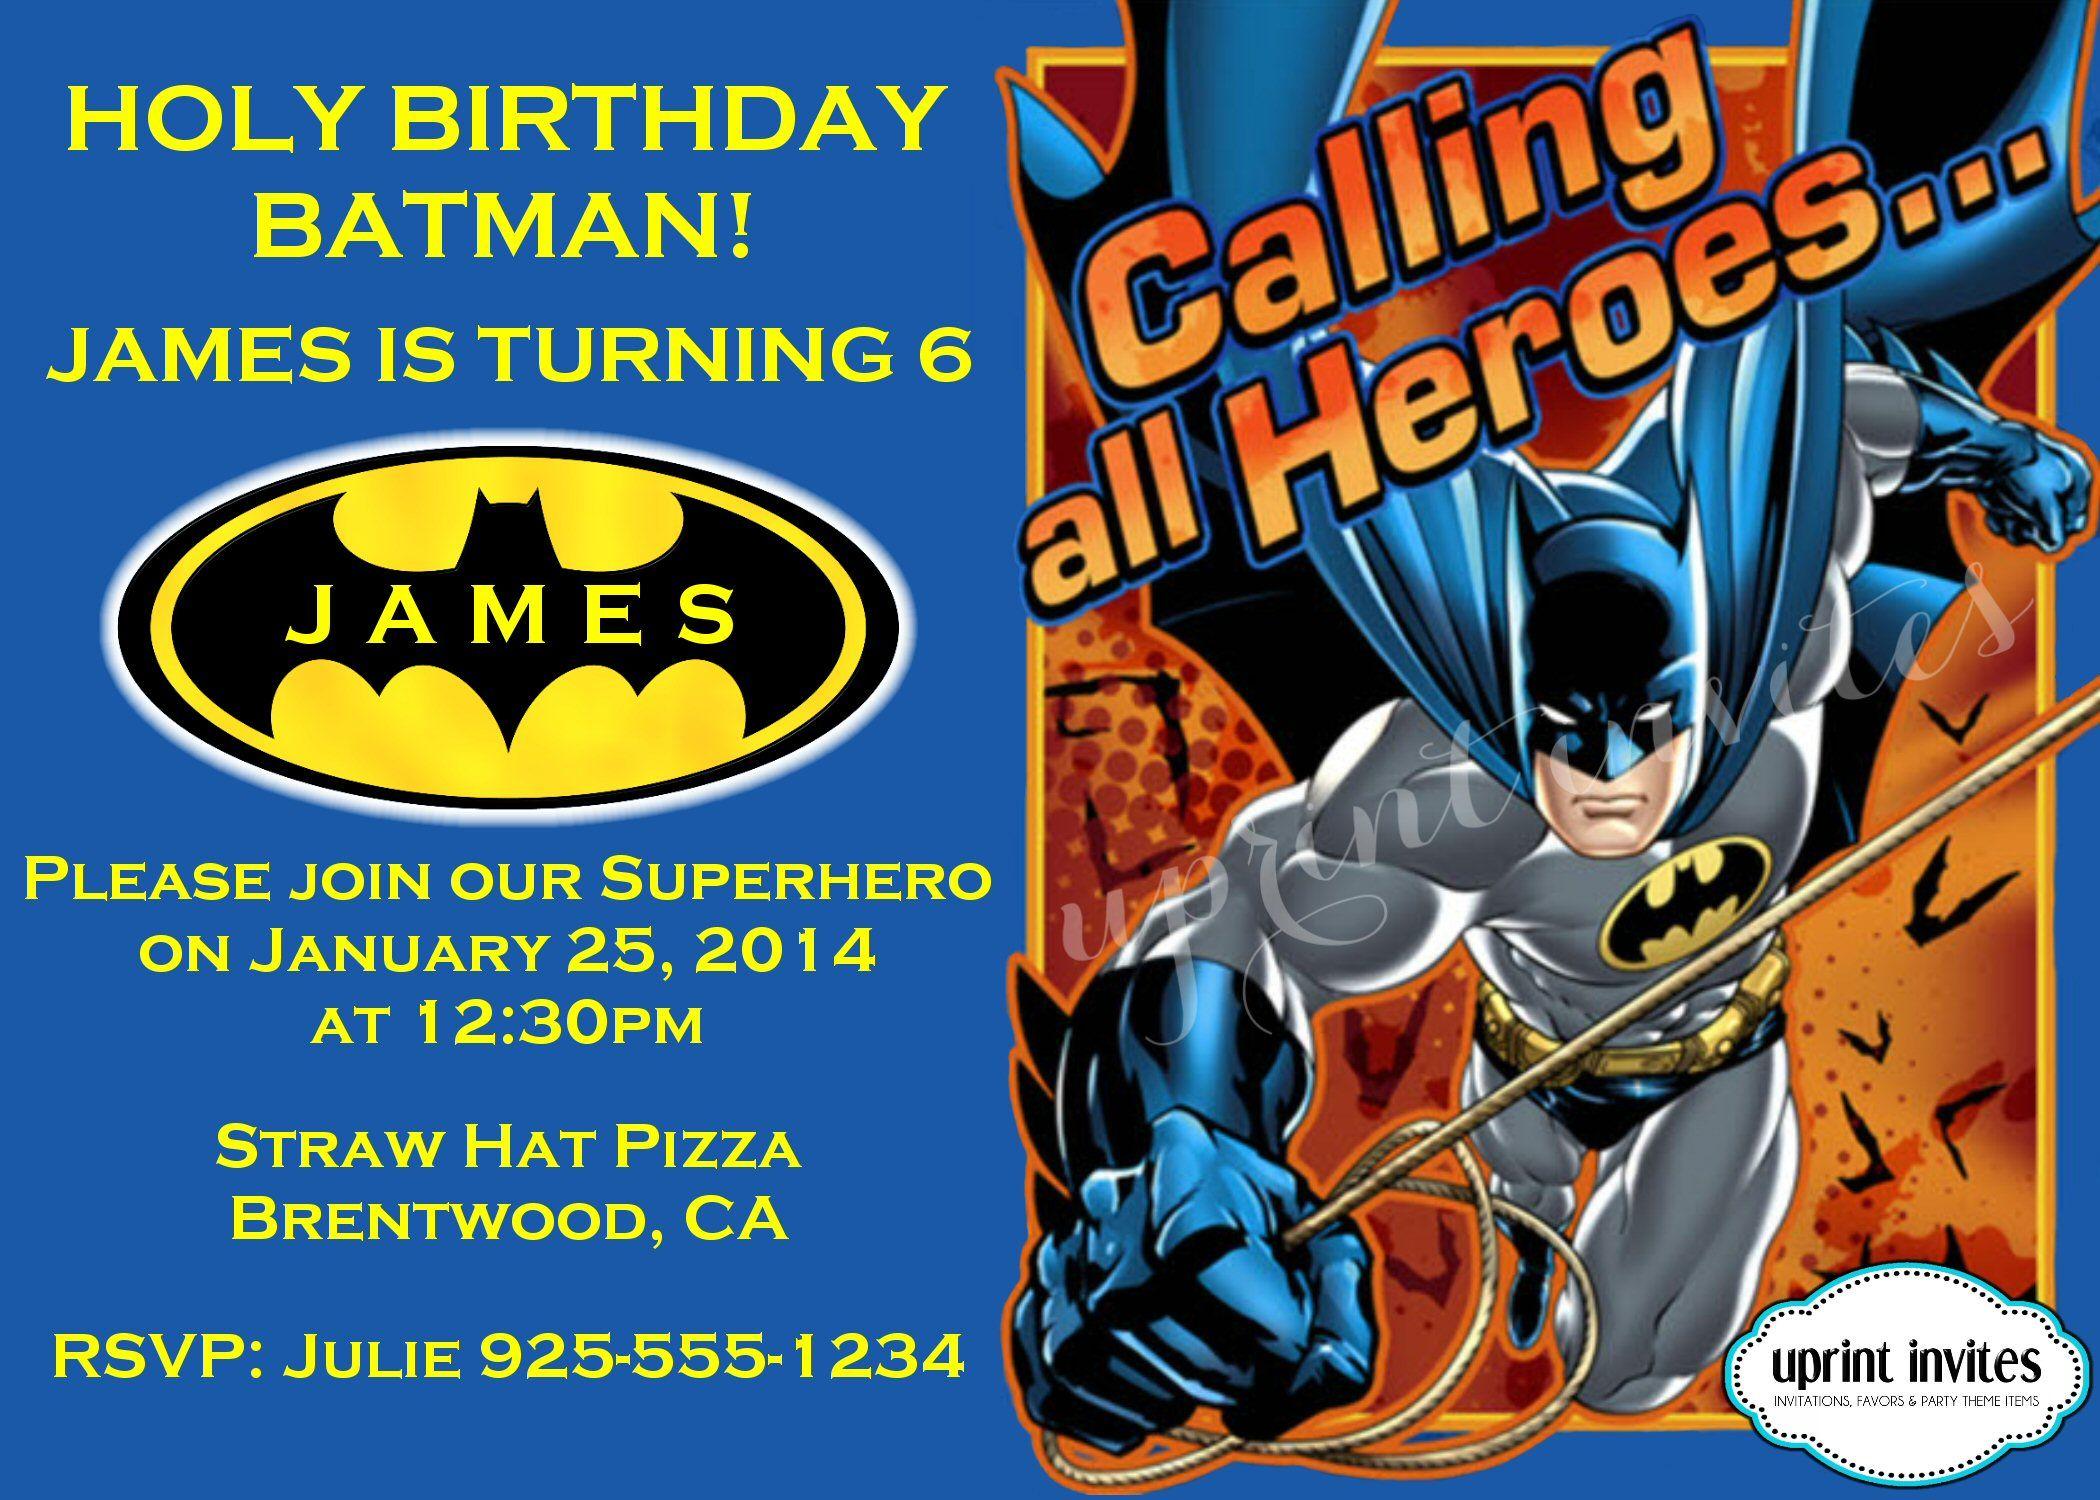 Personalized Invitation uprintinvitations batman